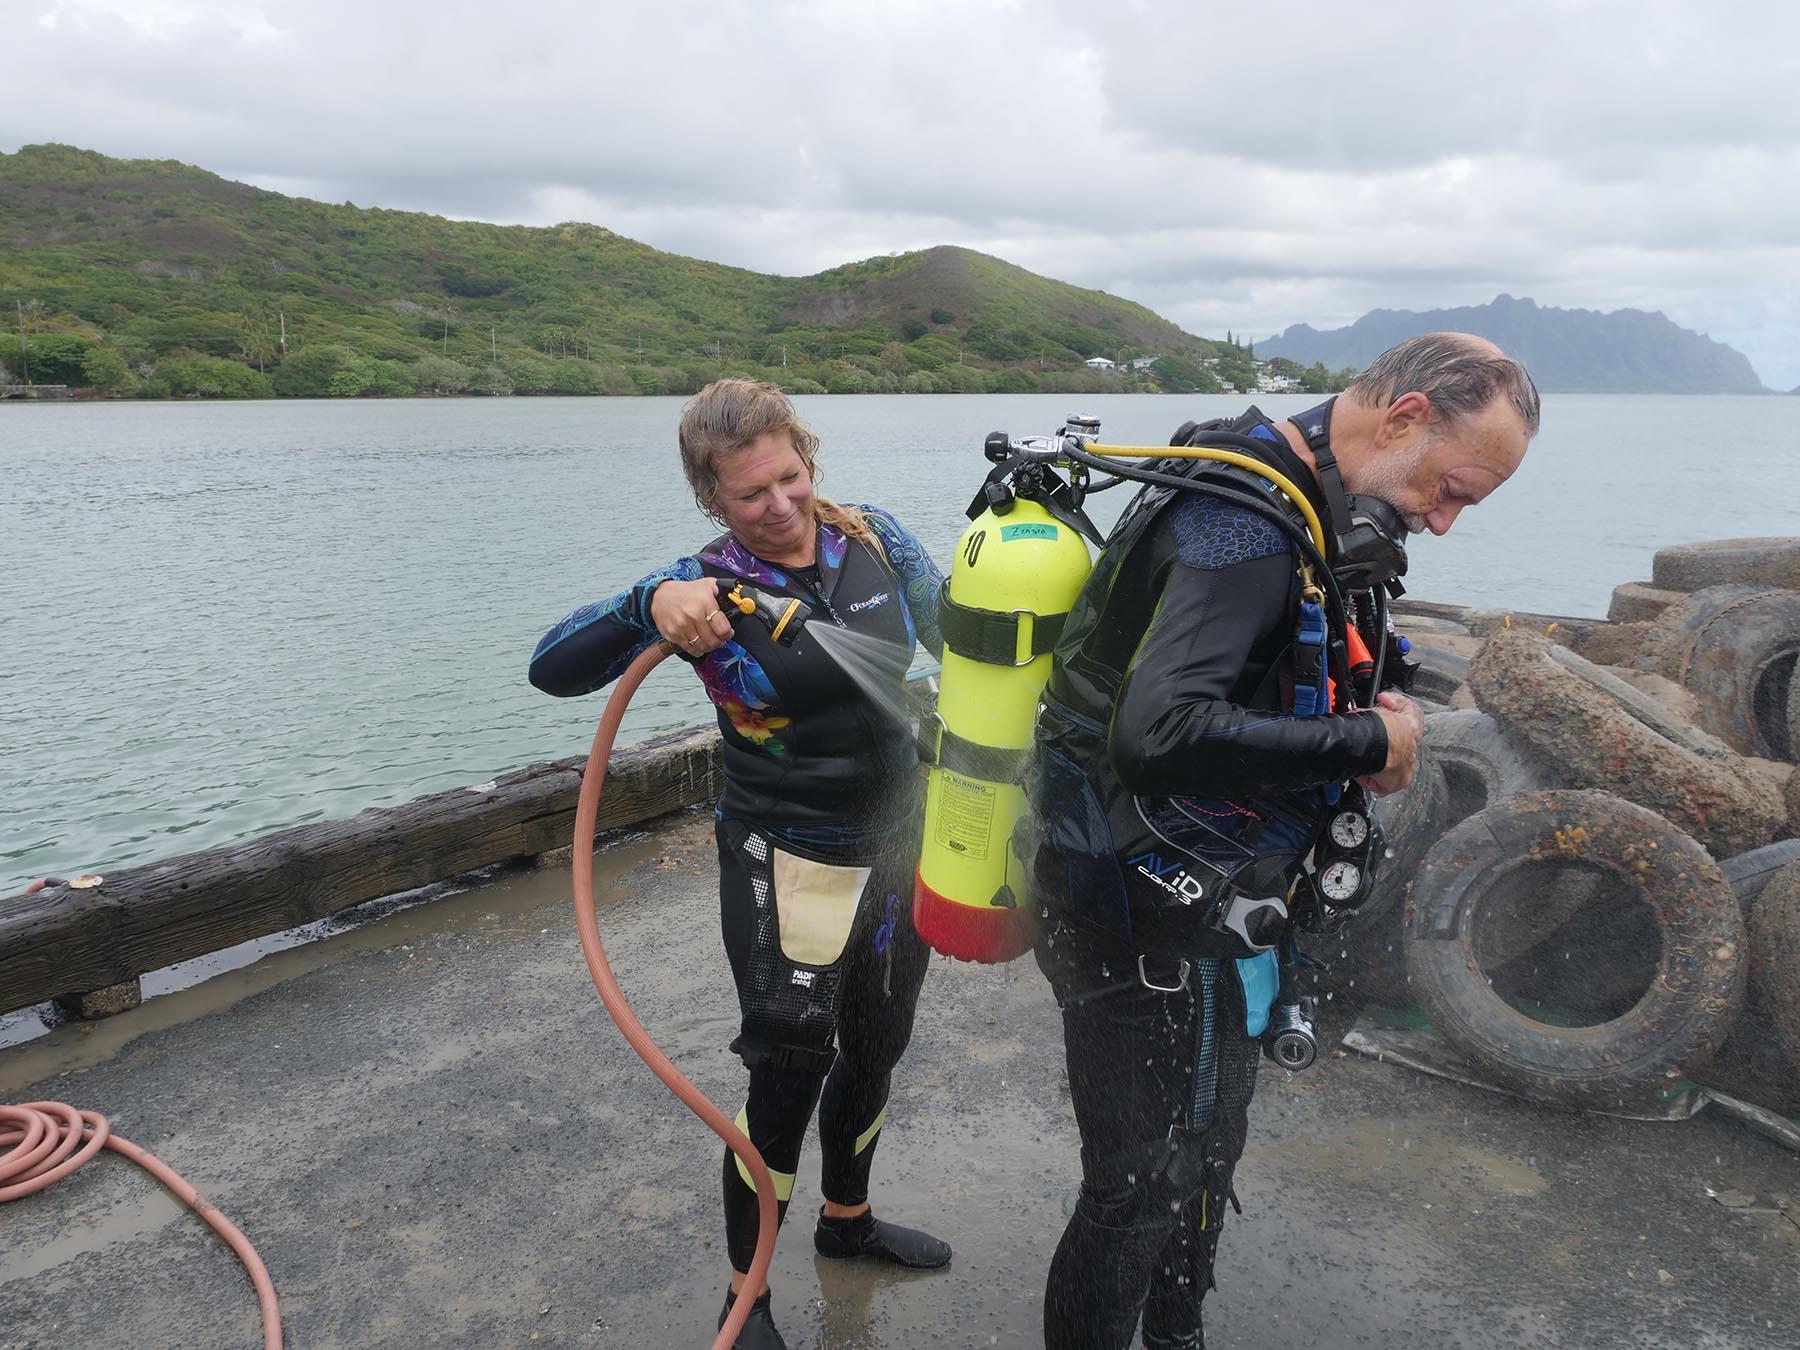 <p>Marjorie Zensen sprays off her husband Mark England after the cleanup dive.</p>